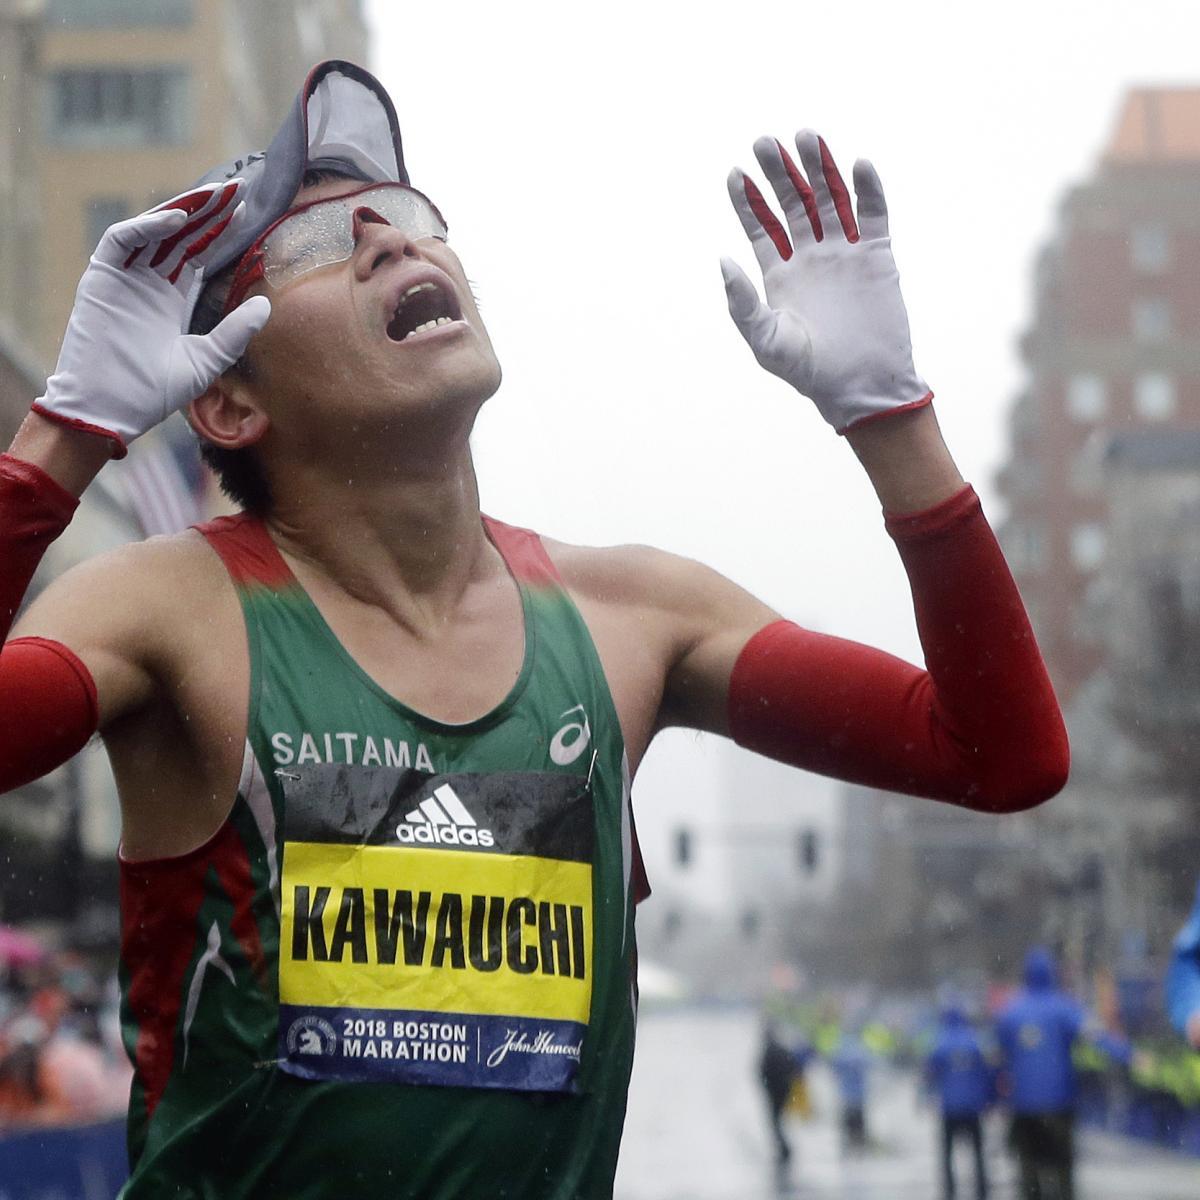 Boston Marathon 2018 Results: Japan's Yuki Kawauchi Wins ...